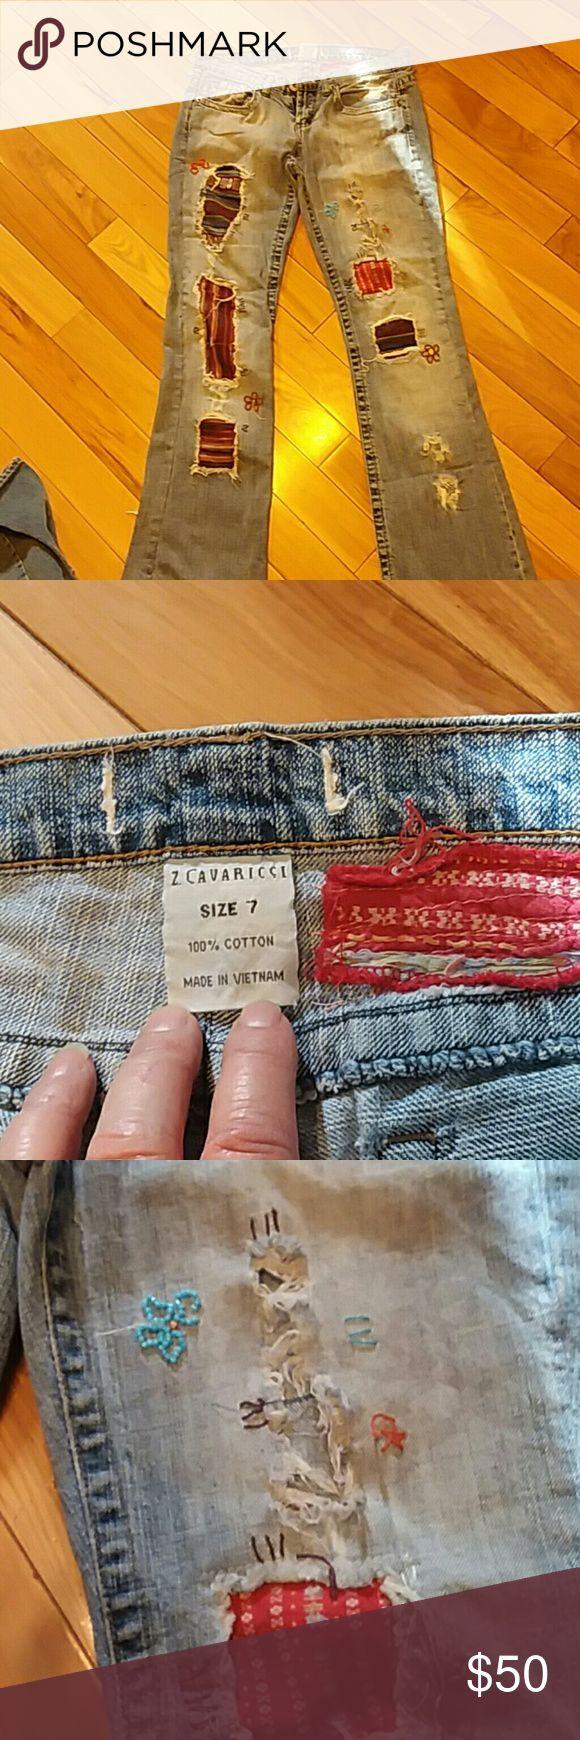 Women's tattered jeans Women's tattered jeans Z cavaricci Jeans Straight Leg